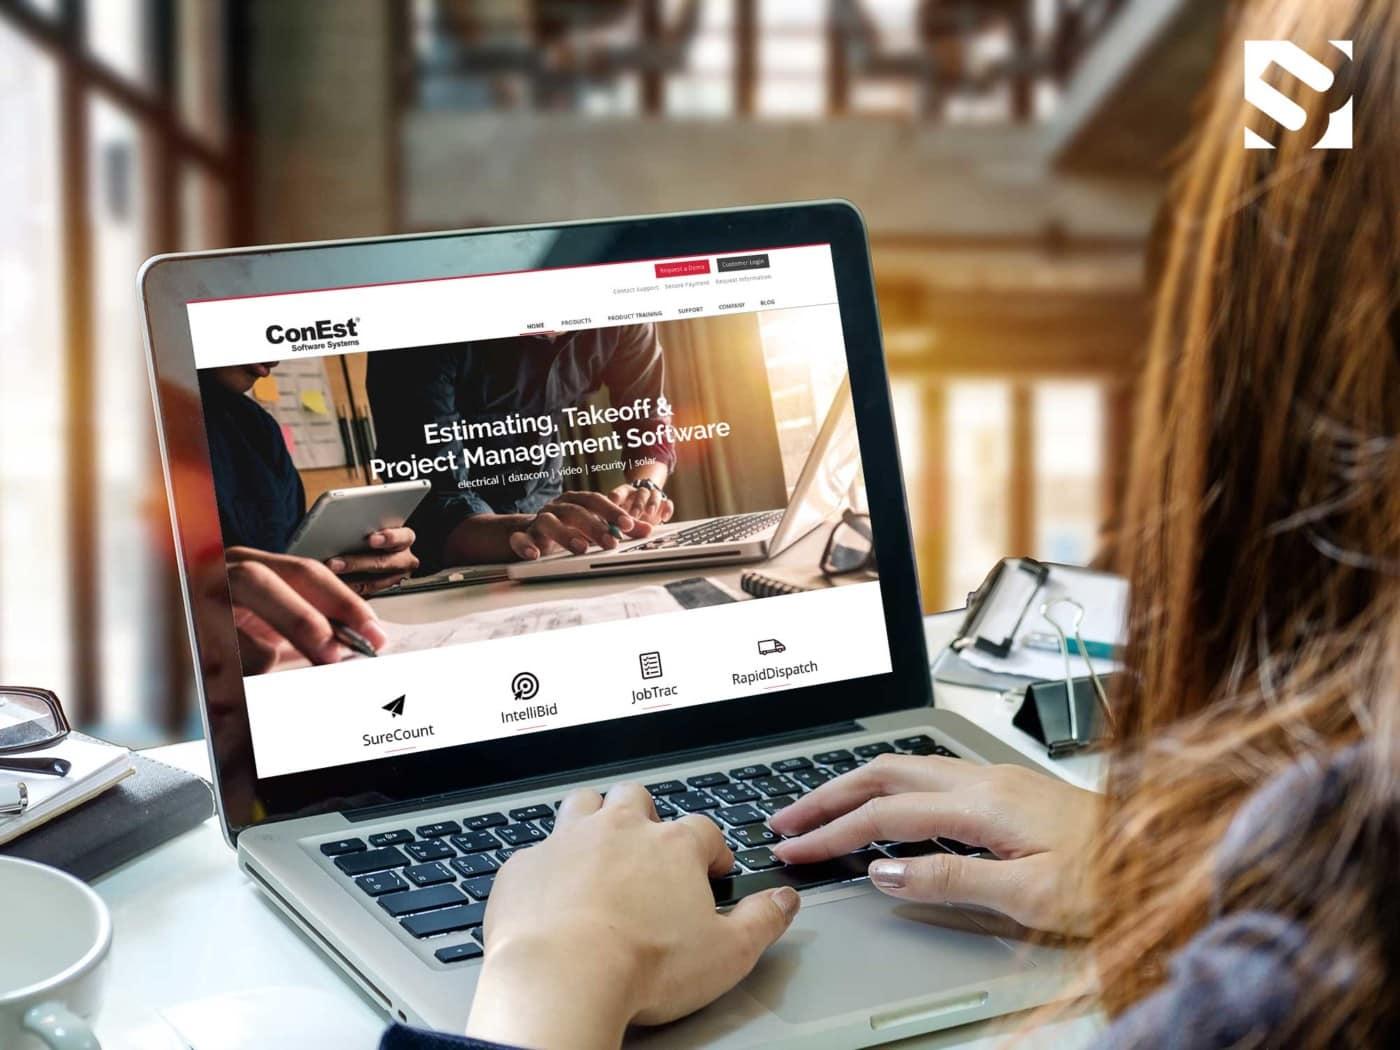 ConEst Gets a New Website Design